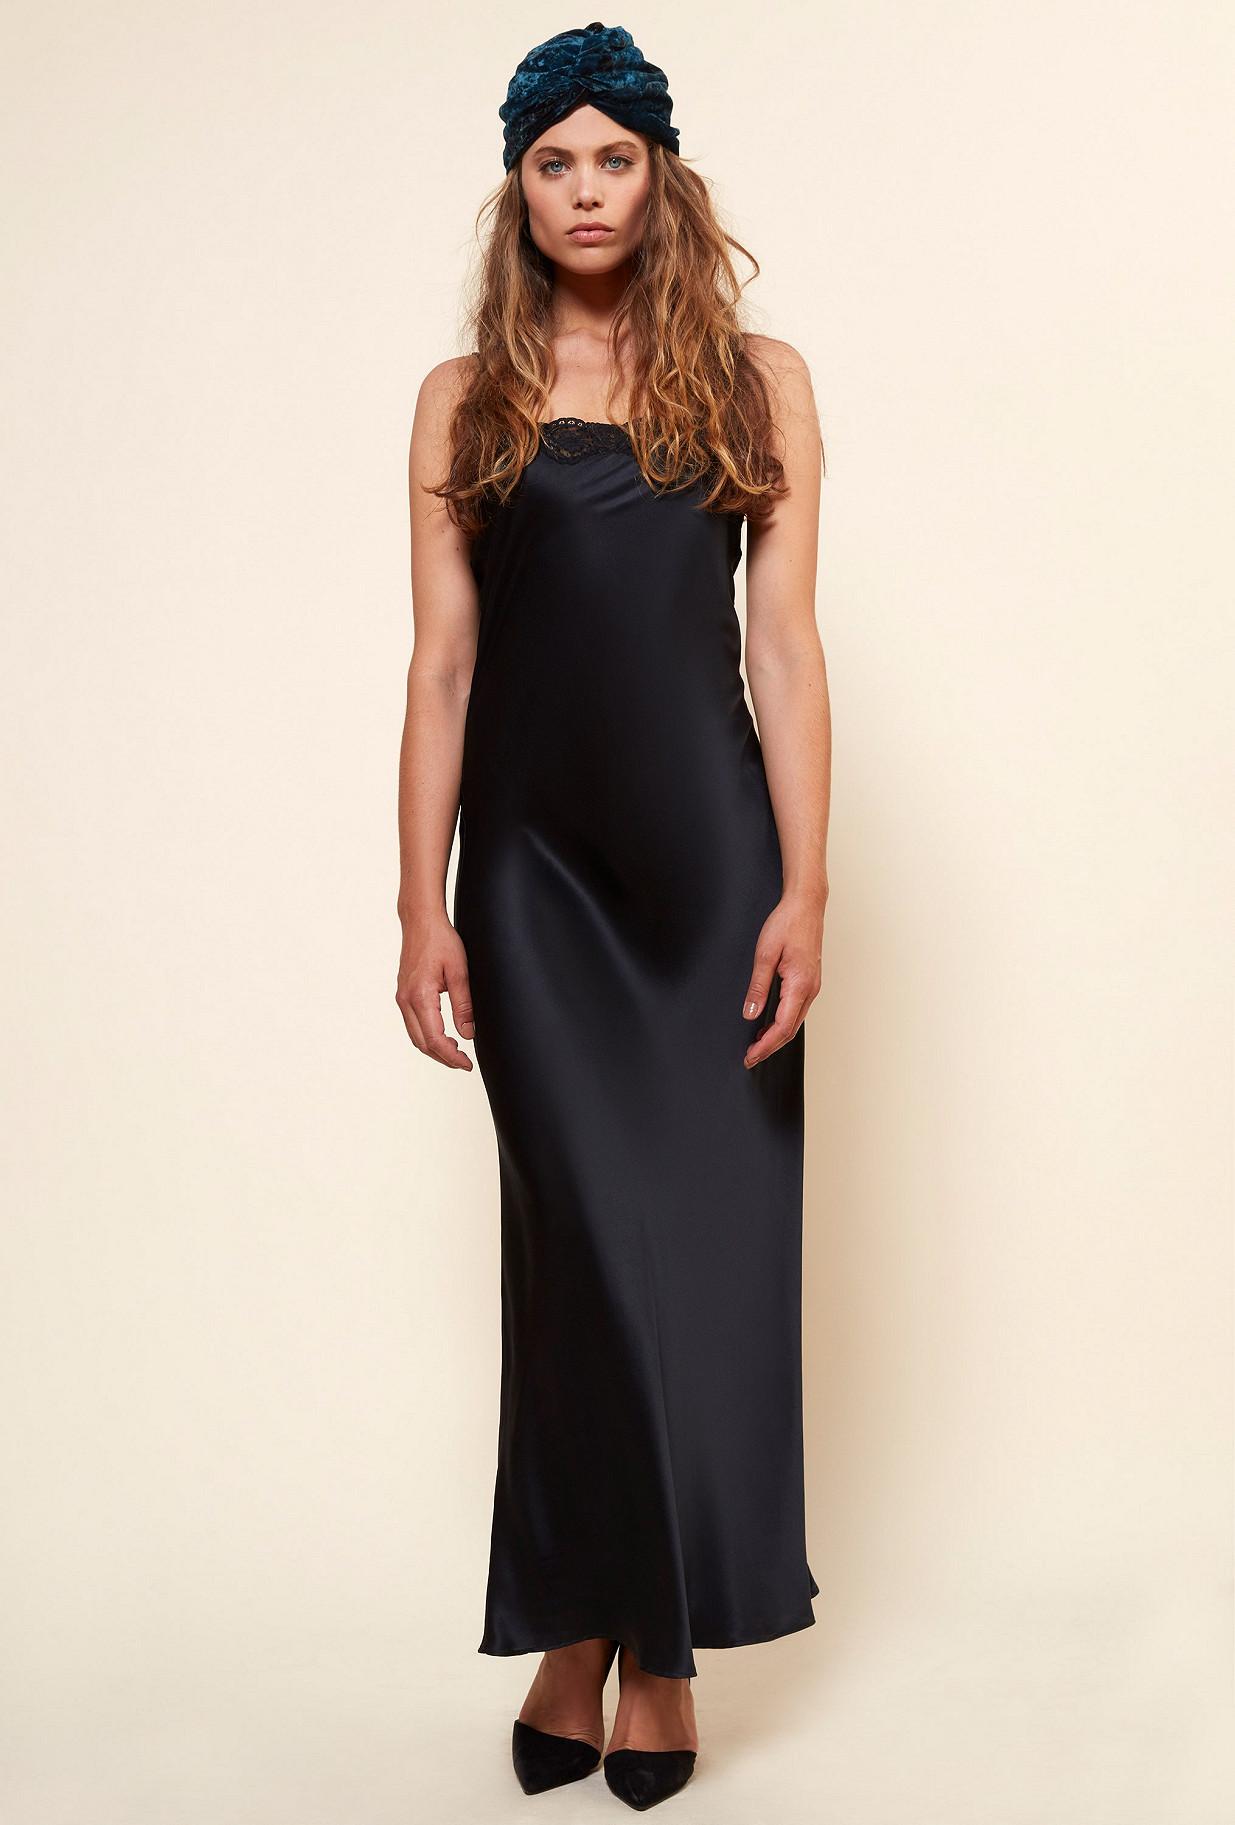 clothes store Dress  Alicante french designer fashion Paris